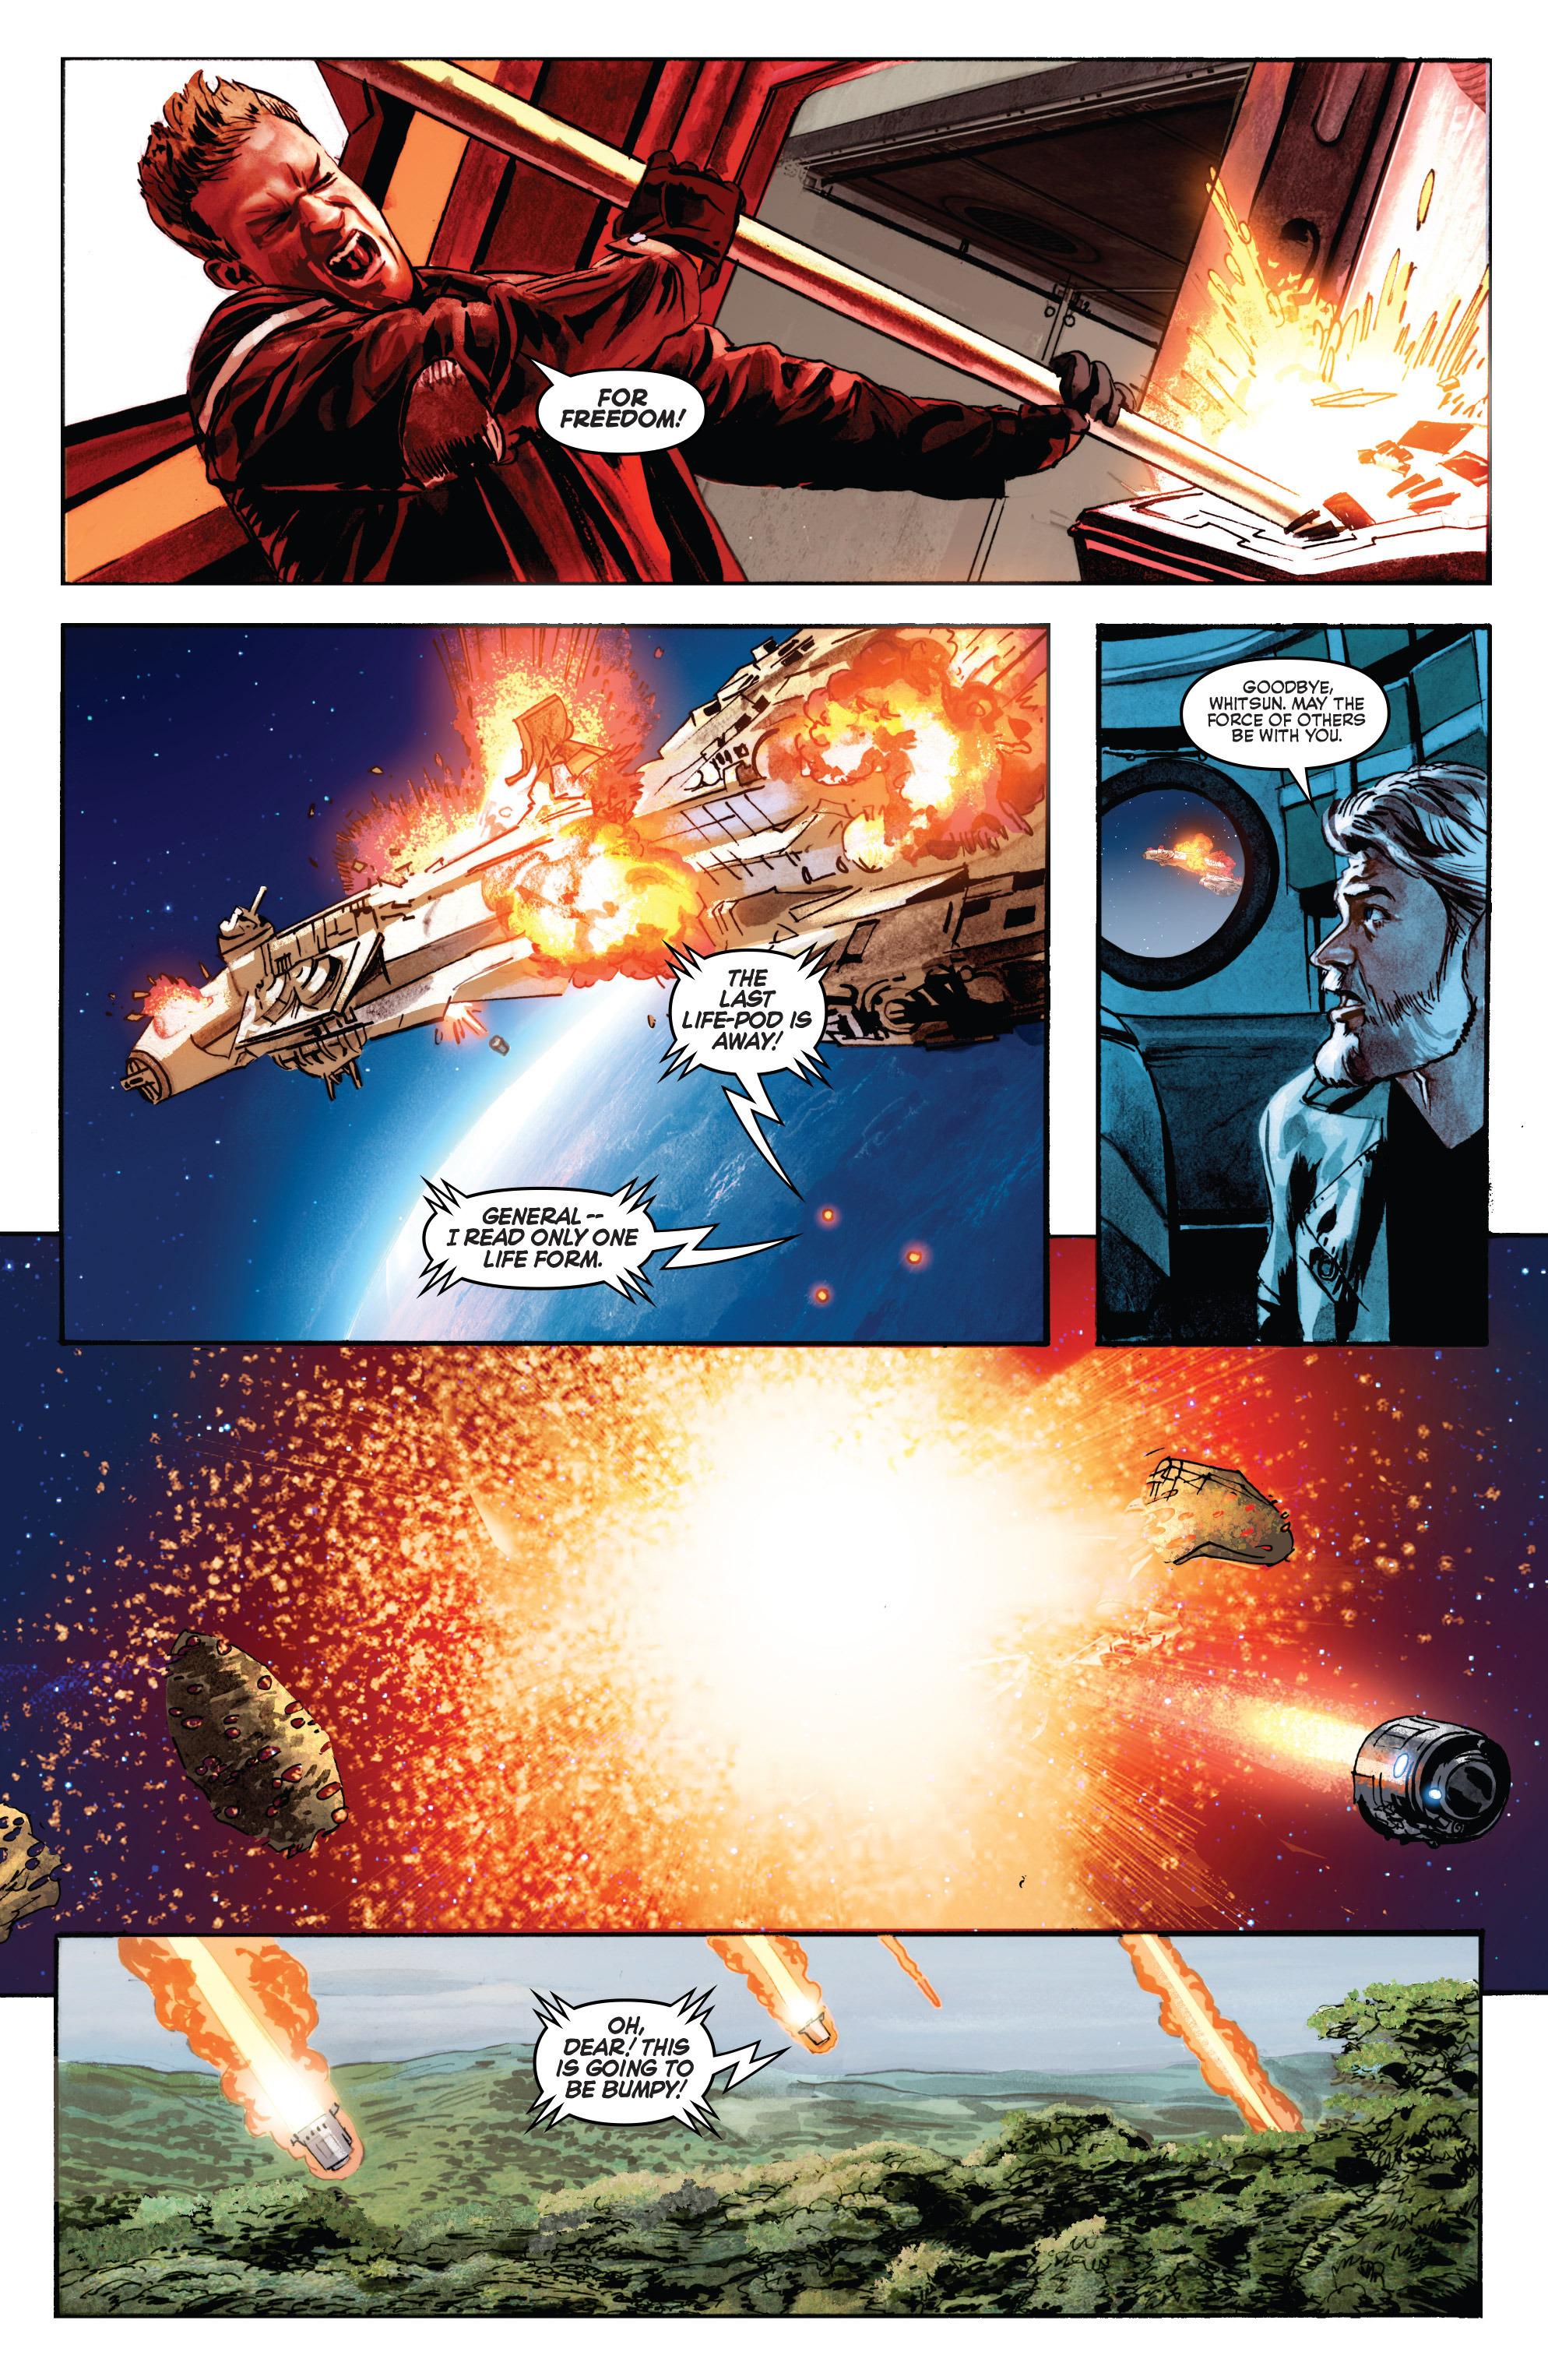 THE STAR WARS comic (2015, Marvel edition) Vol.7 11